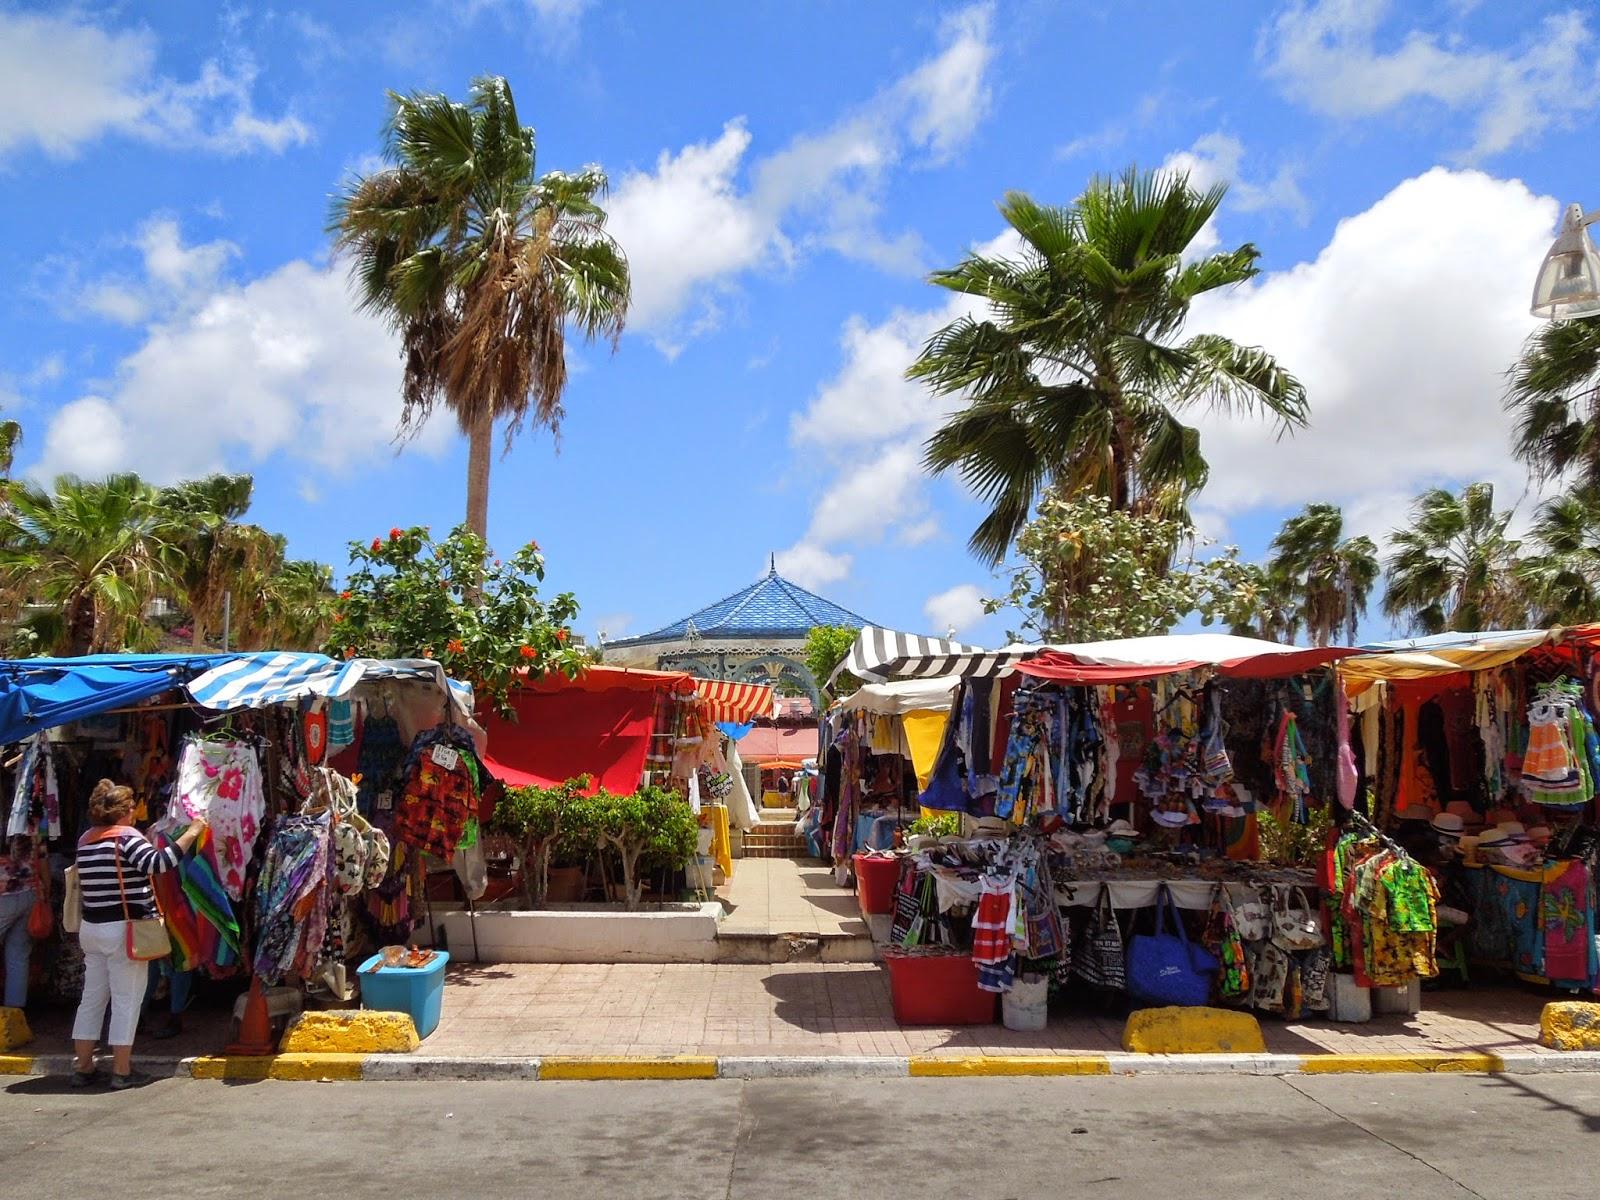 Marigot open market